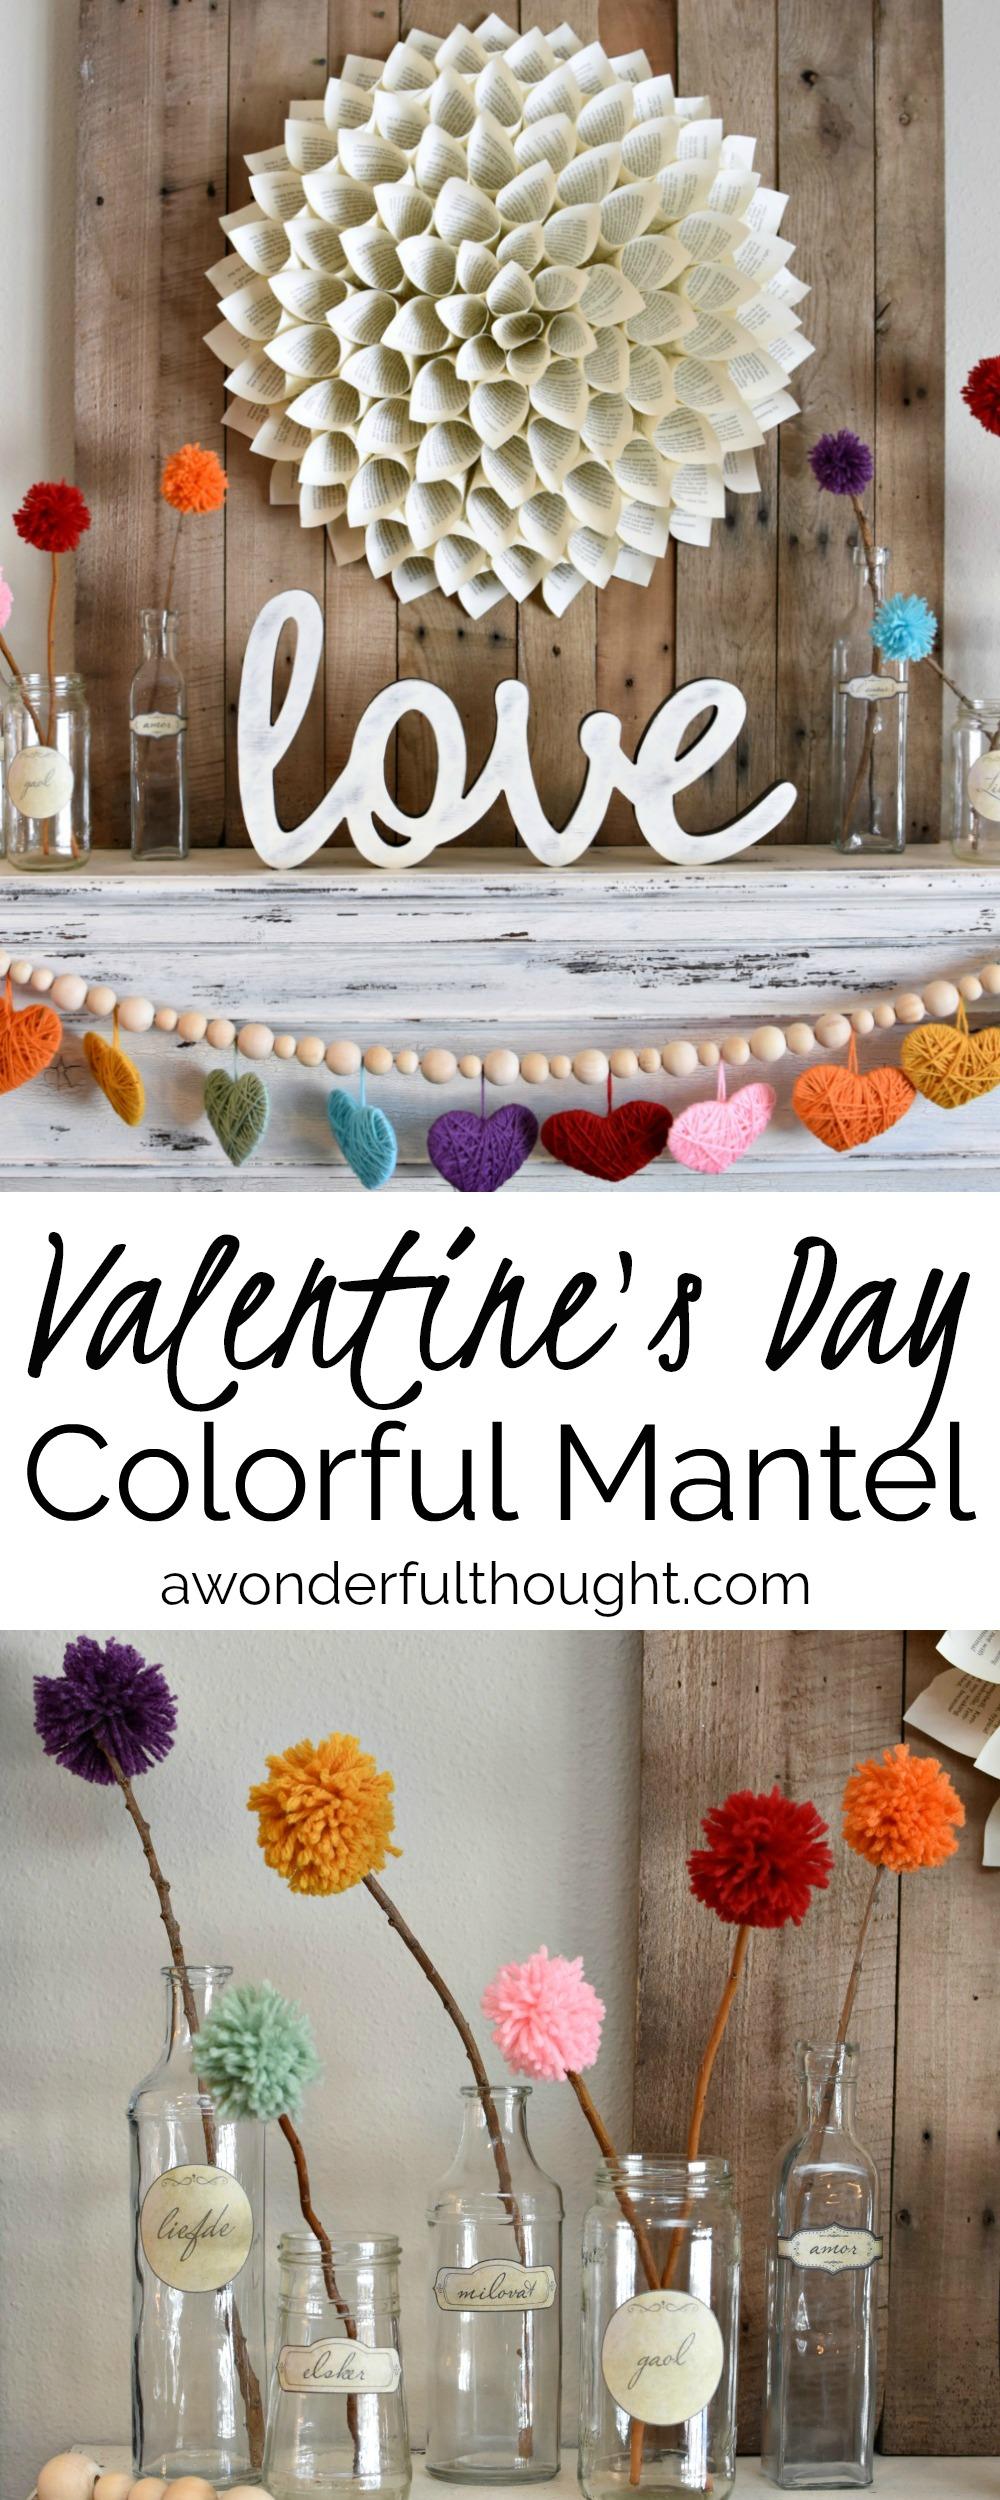 Colorful Valentine's Day Mantel #valentinesday #valentinesdaydecor #valentinesdaymantel #awonderfulthought